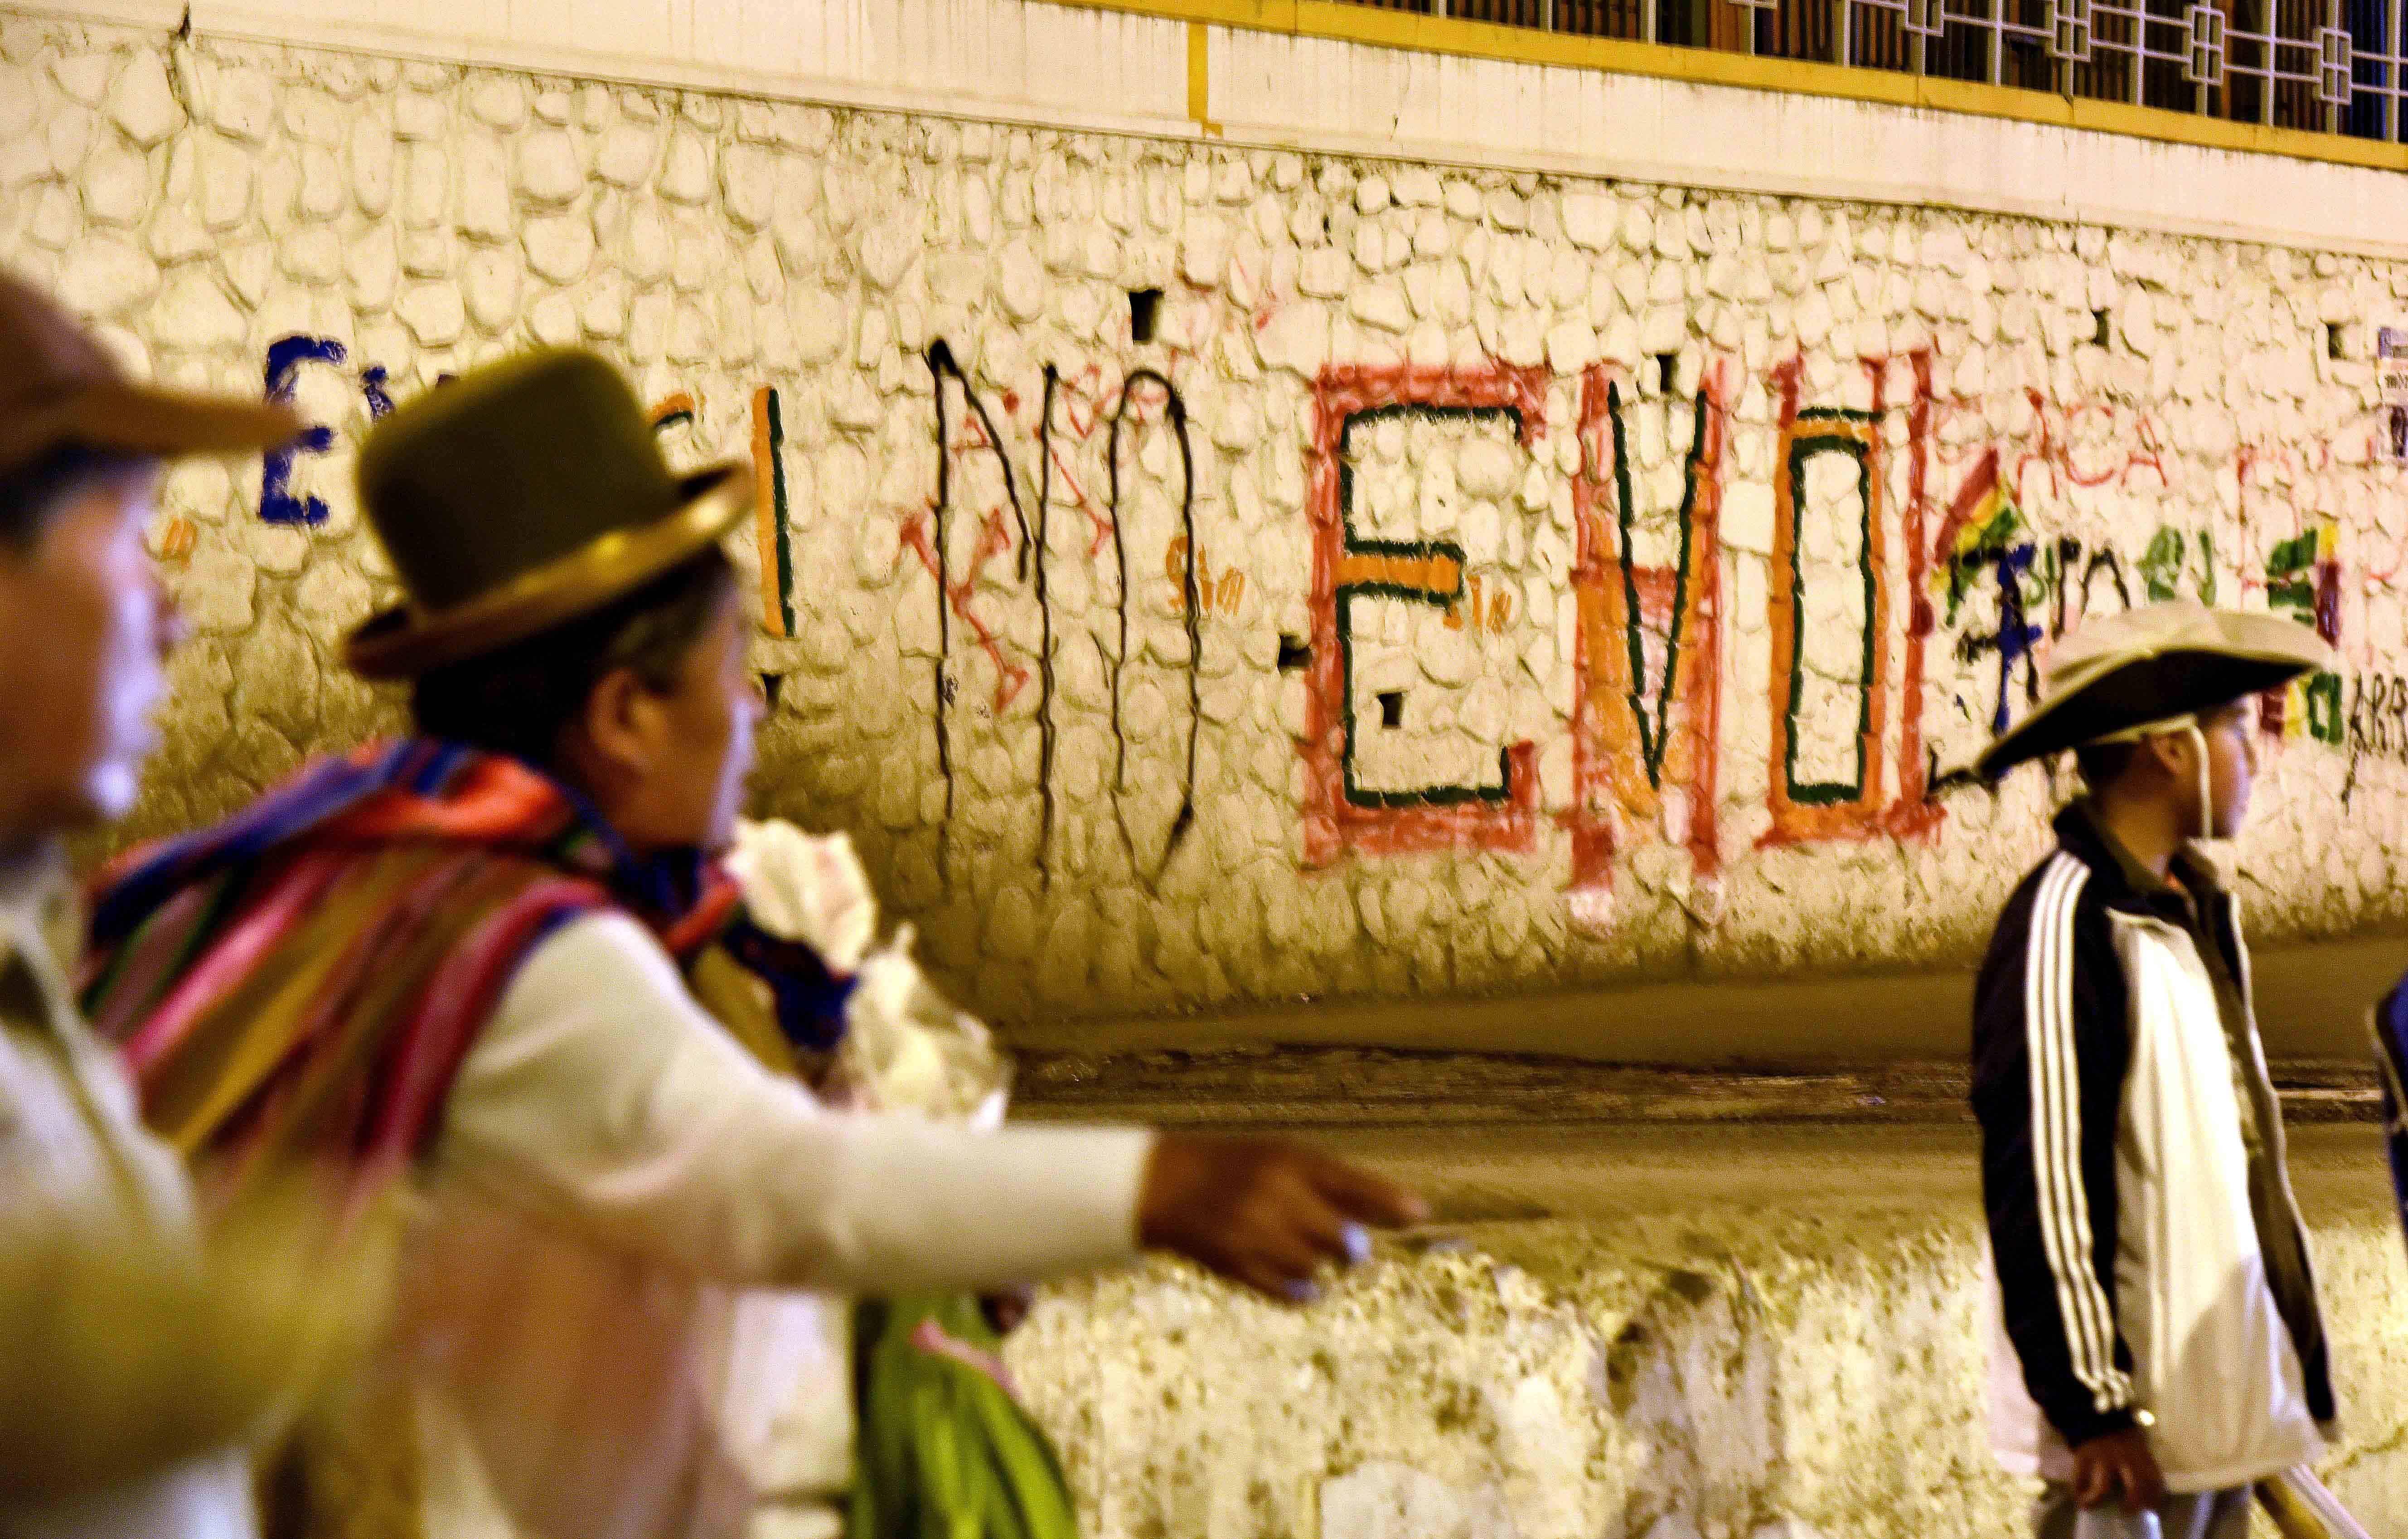 Evo Morales referendum graffiti in Bolivia